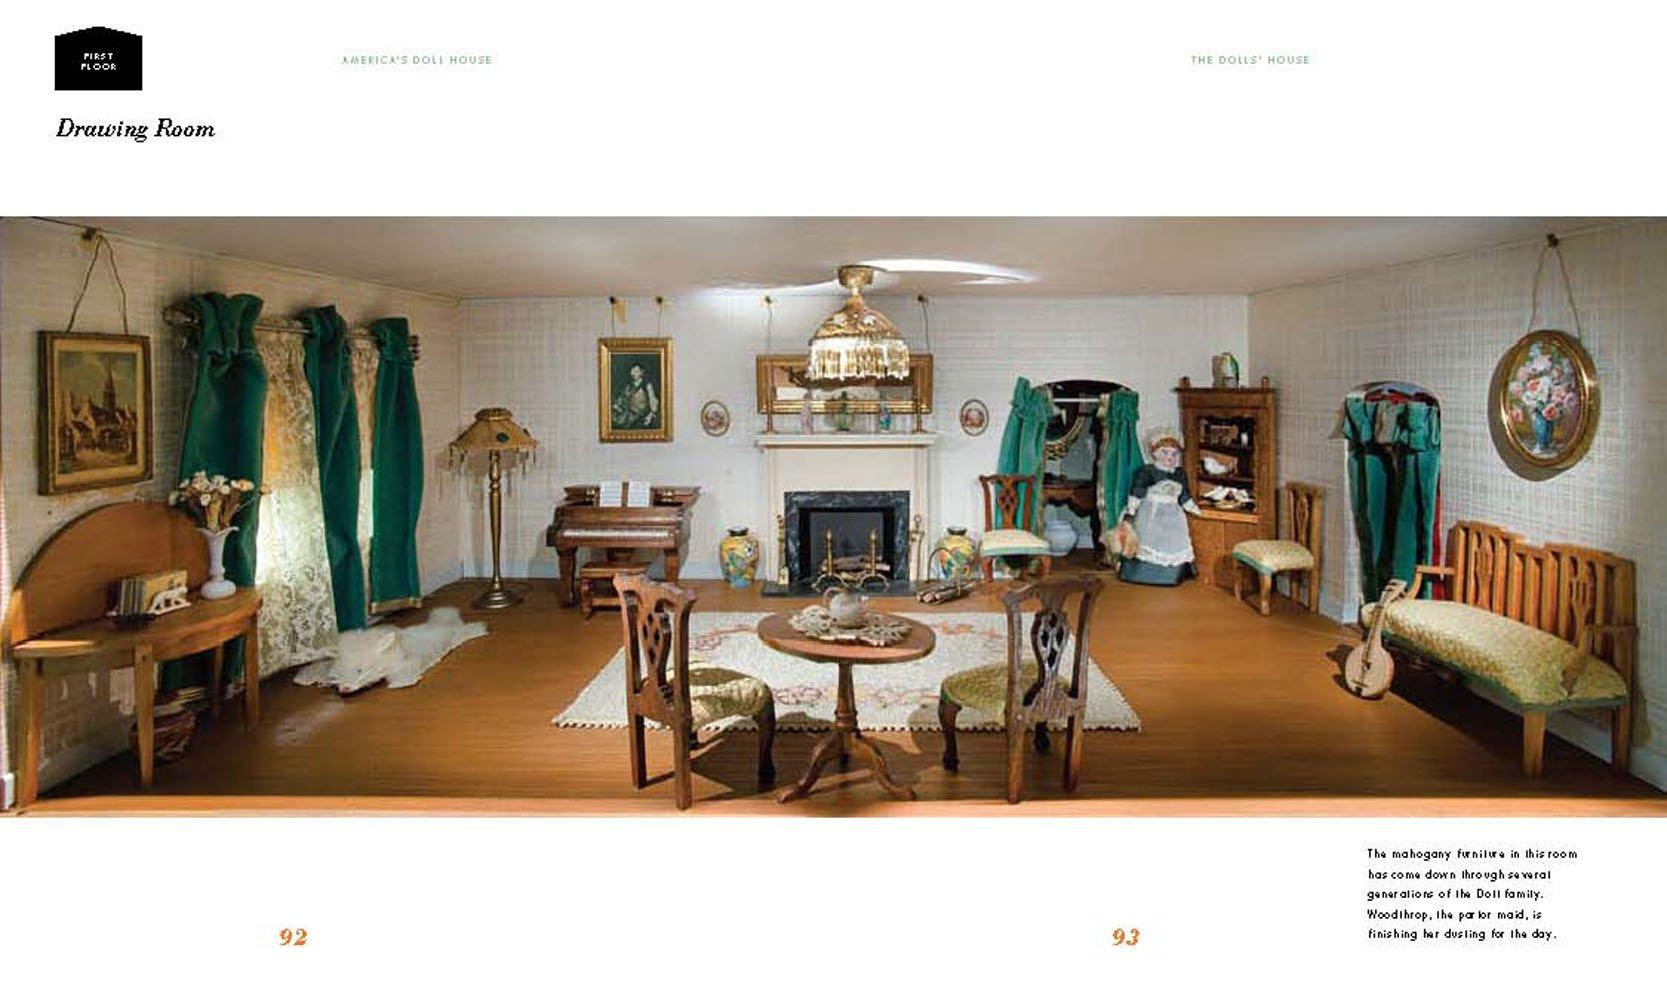 Zabawki THREE DOLLS HOUSE MINIATURE BOOKS MILLENNIUM TRILOGY Handmade 1:12th Scale